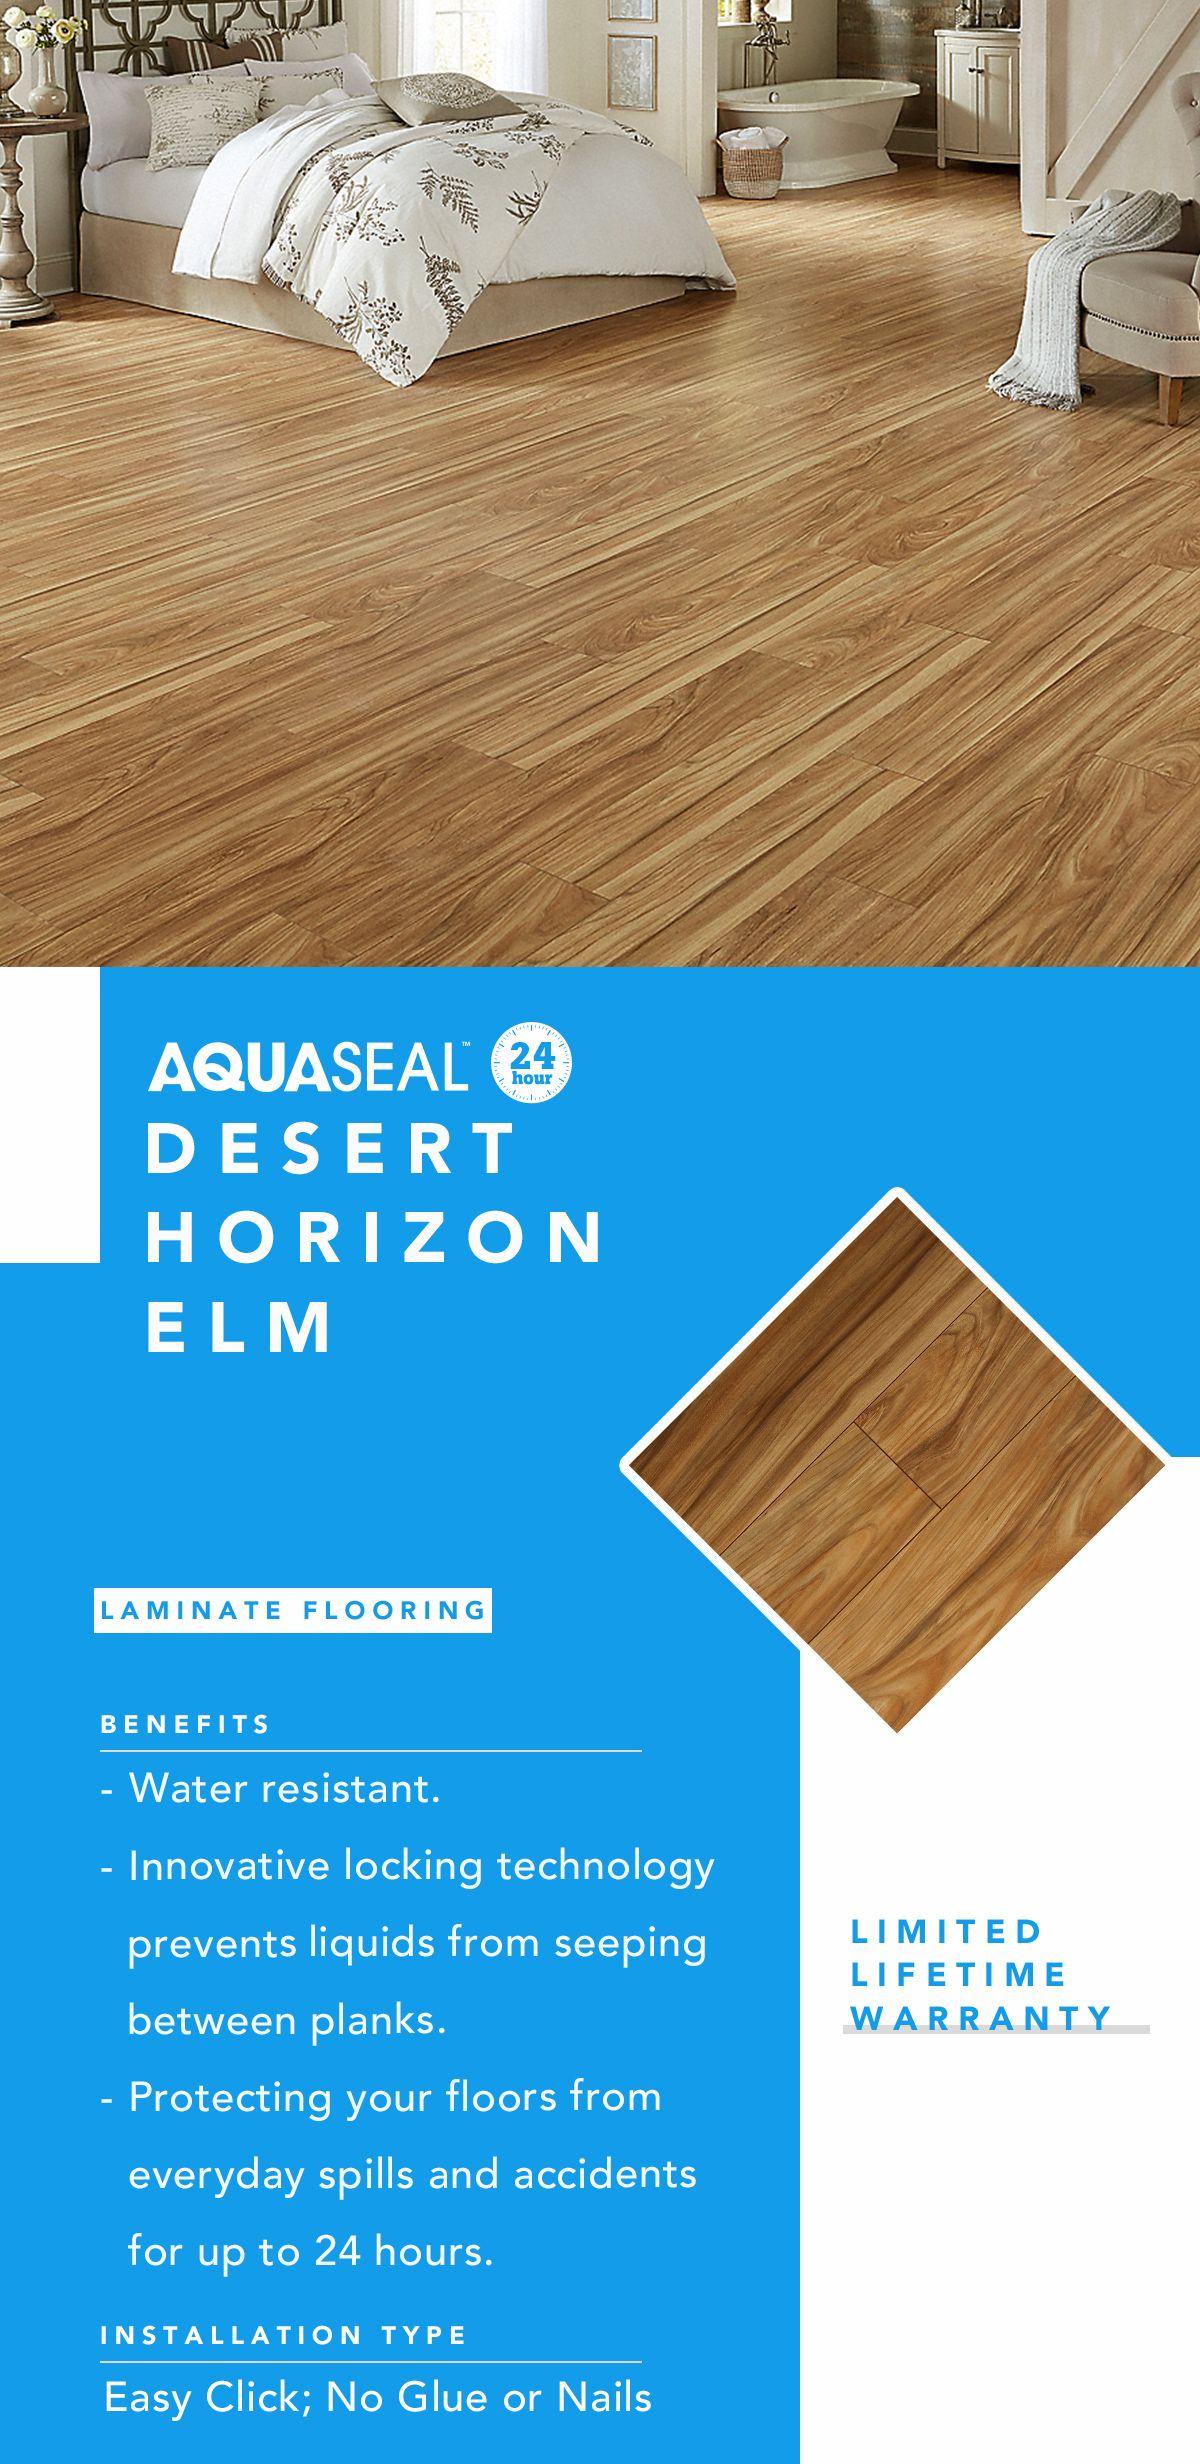 Aquaseal 24 12mm Desert Horizon Elm Laminate Flooring Laminate Flooring Flooring Elm